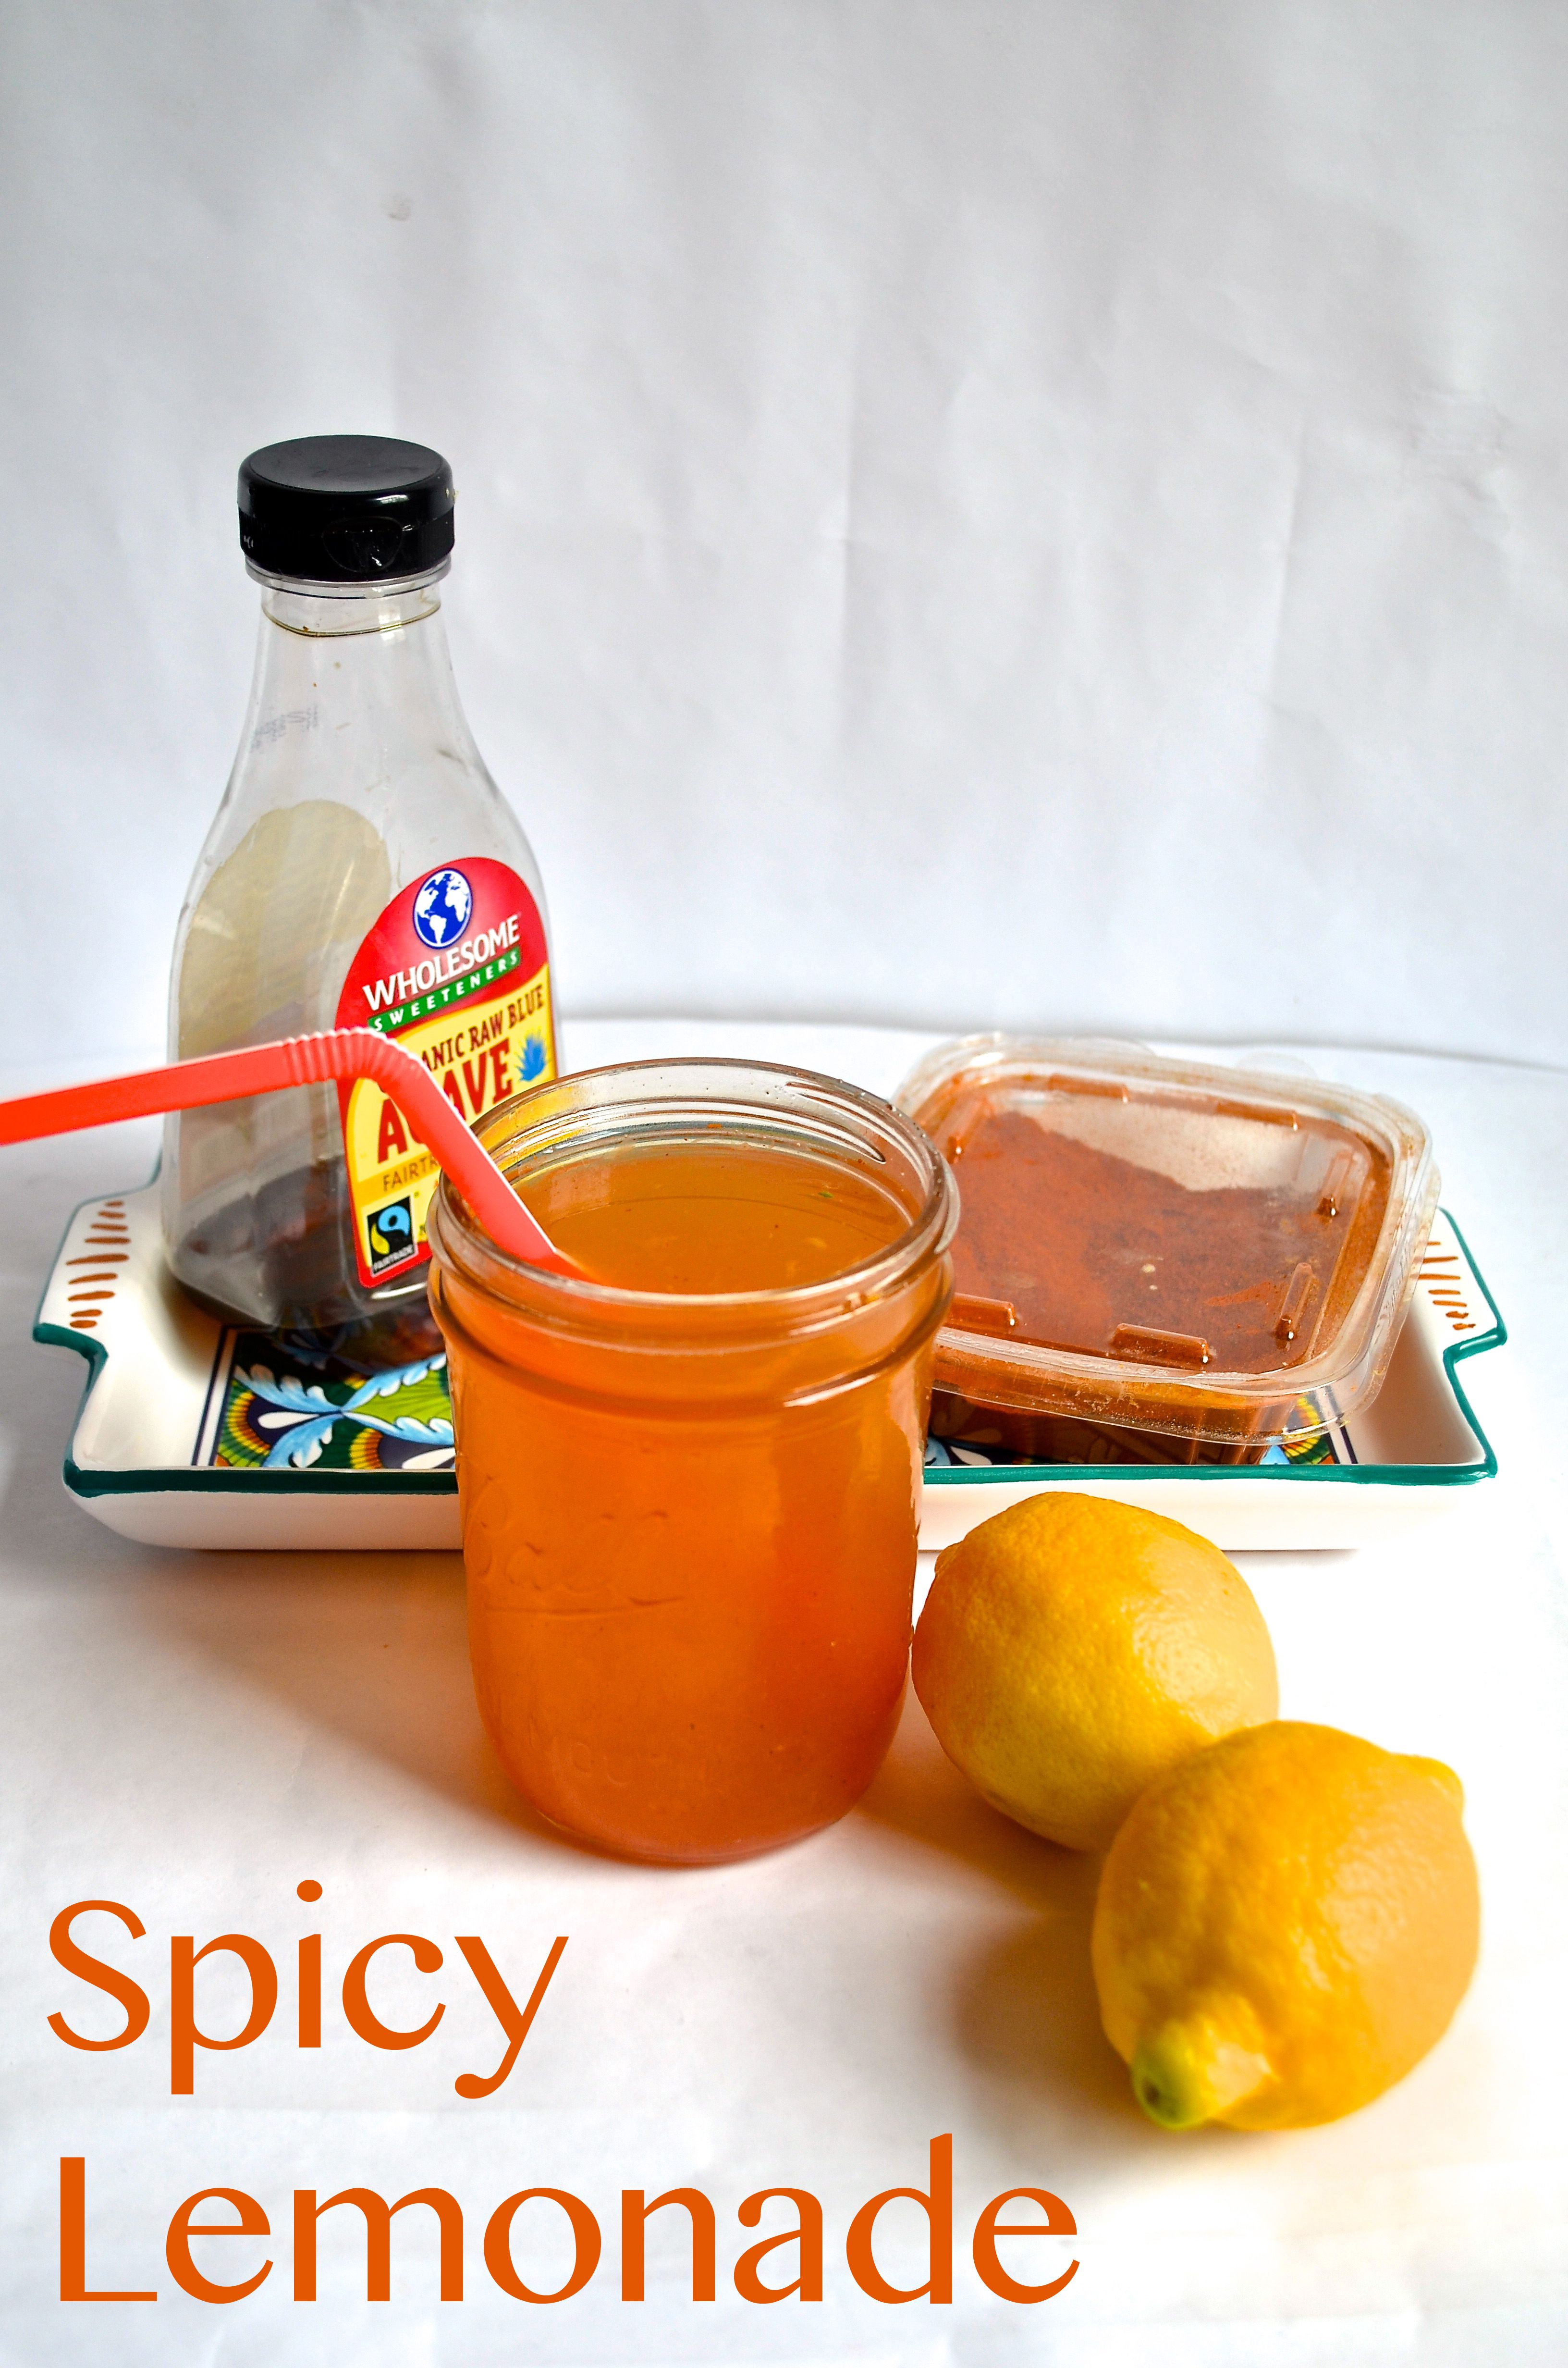 Spicy lemonade pale yellow juicing pinterest blueprint spicy lemonade pale yellow juicing pinterest blueprint cleanse cleanse recipes and cleanse malvernweather Choice Image